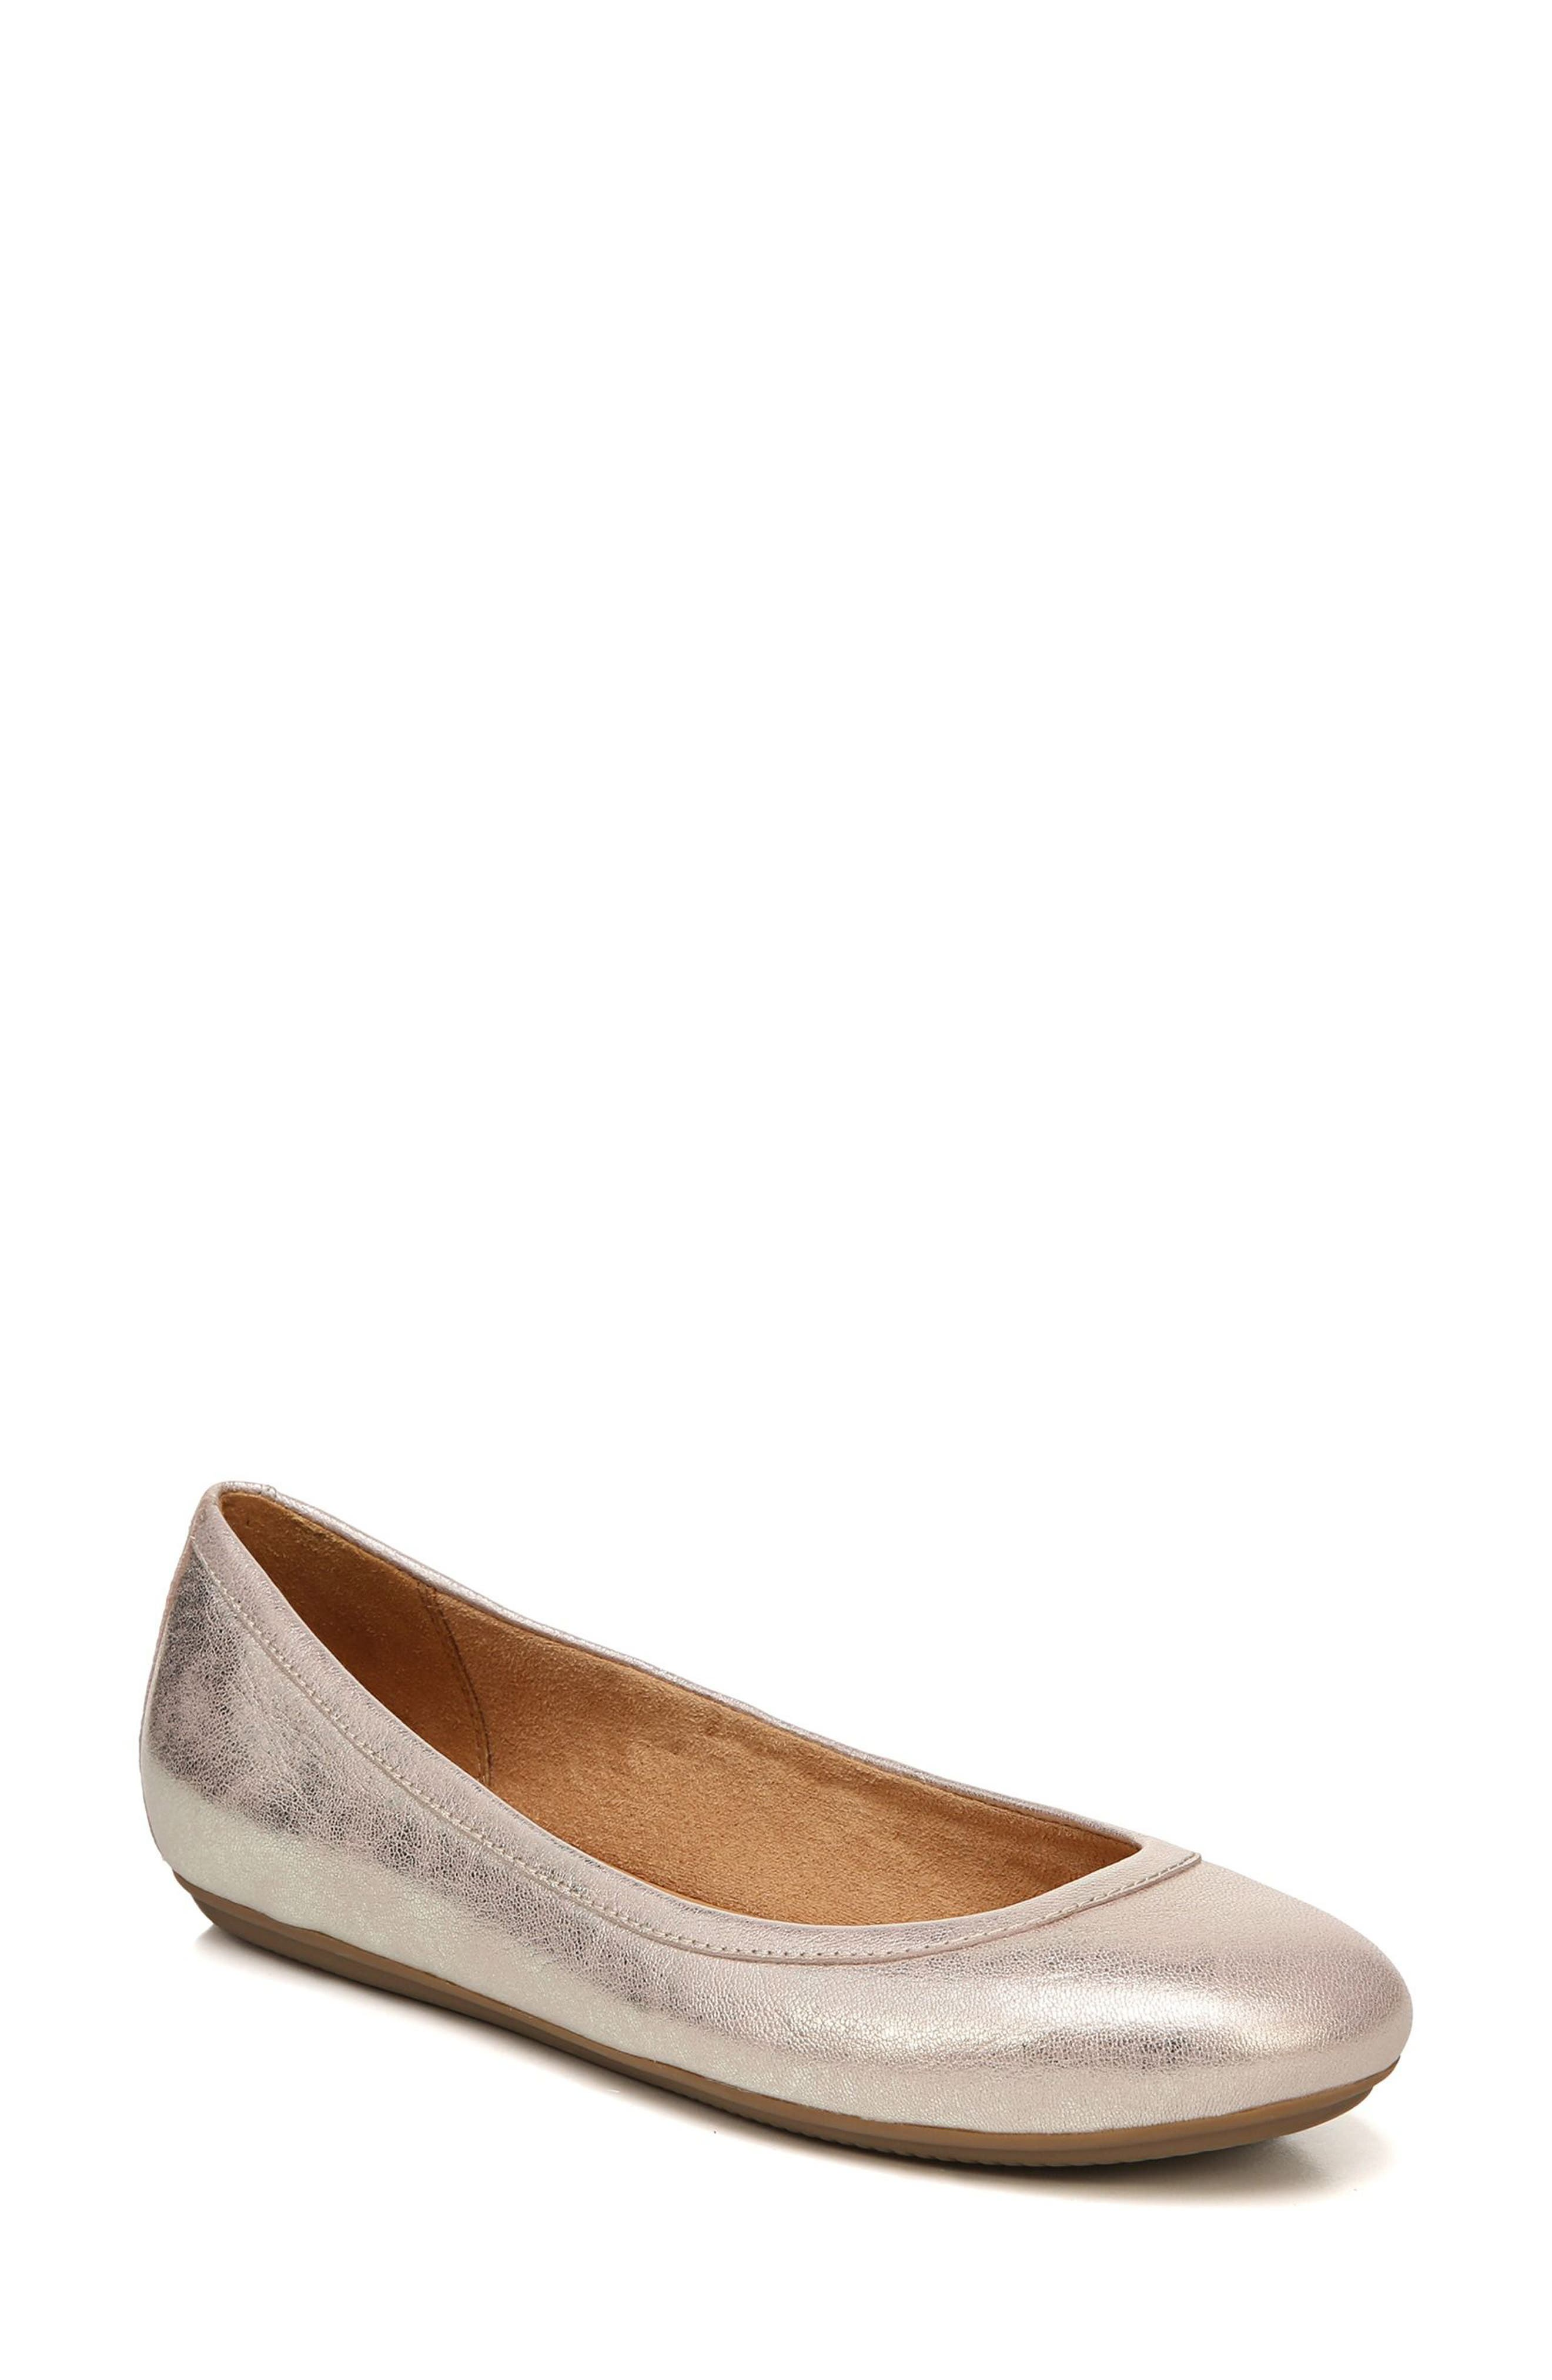 Alternate Image 1 Selected - Naturalizer Brittany Ballet Flat (Women)